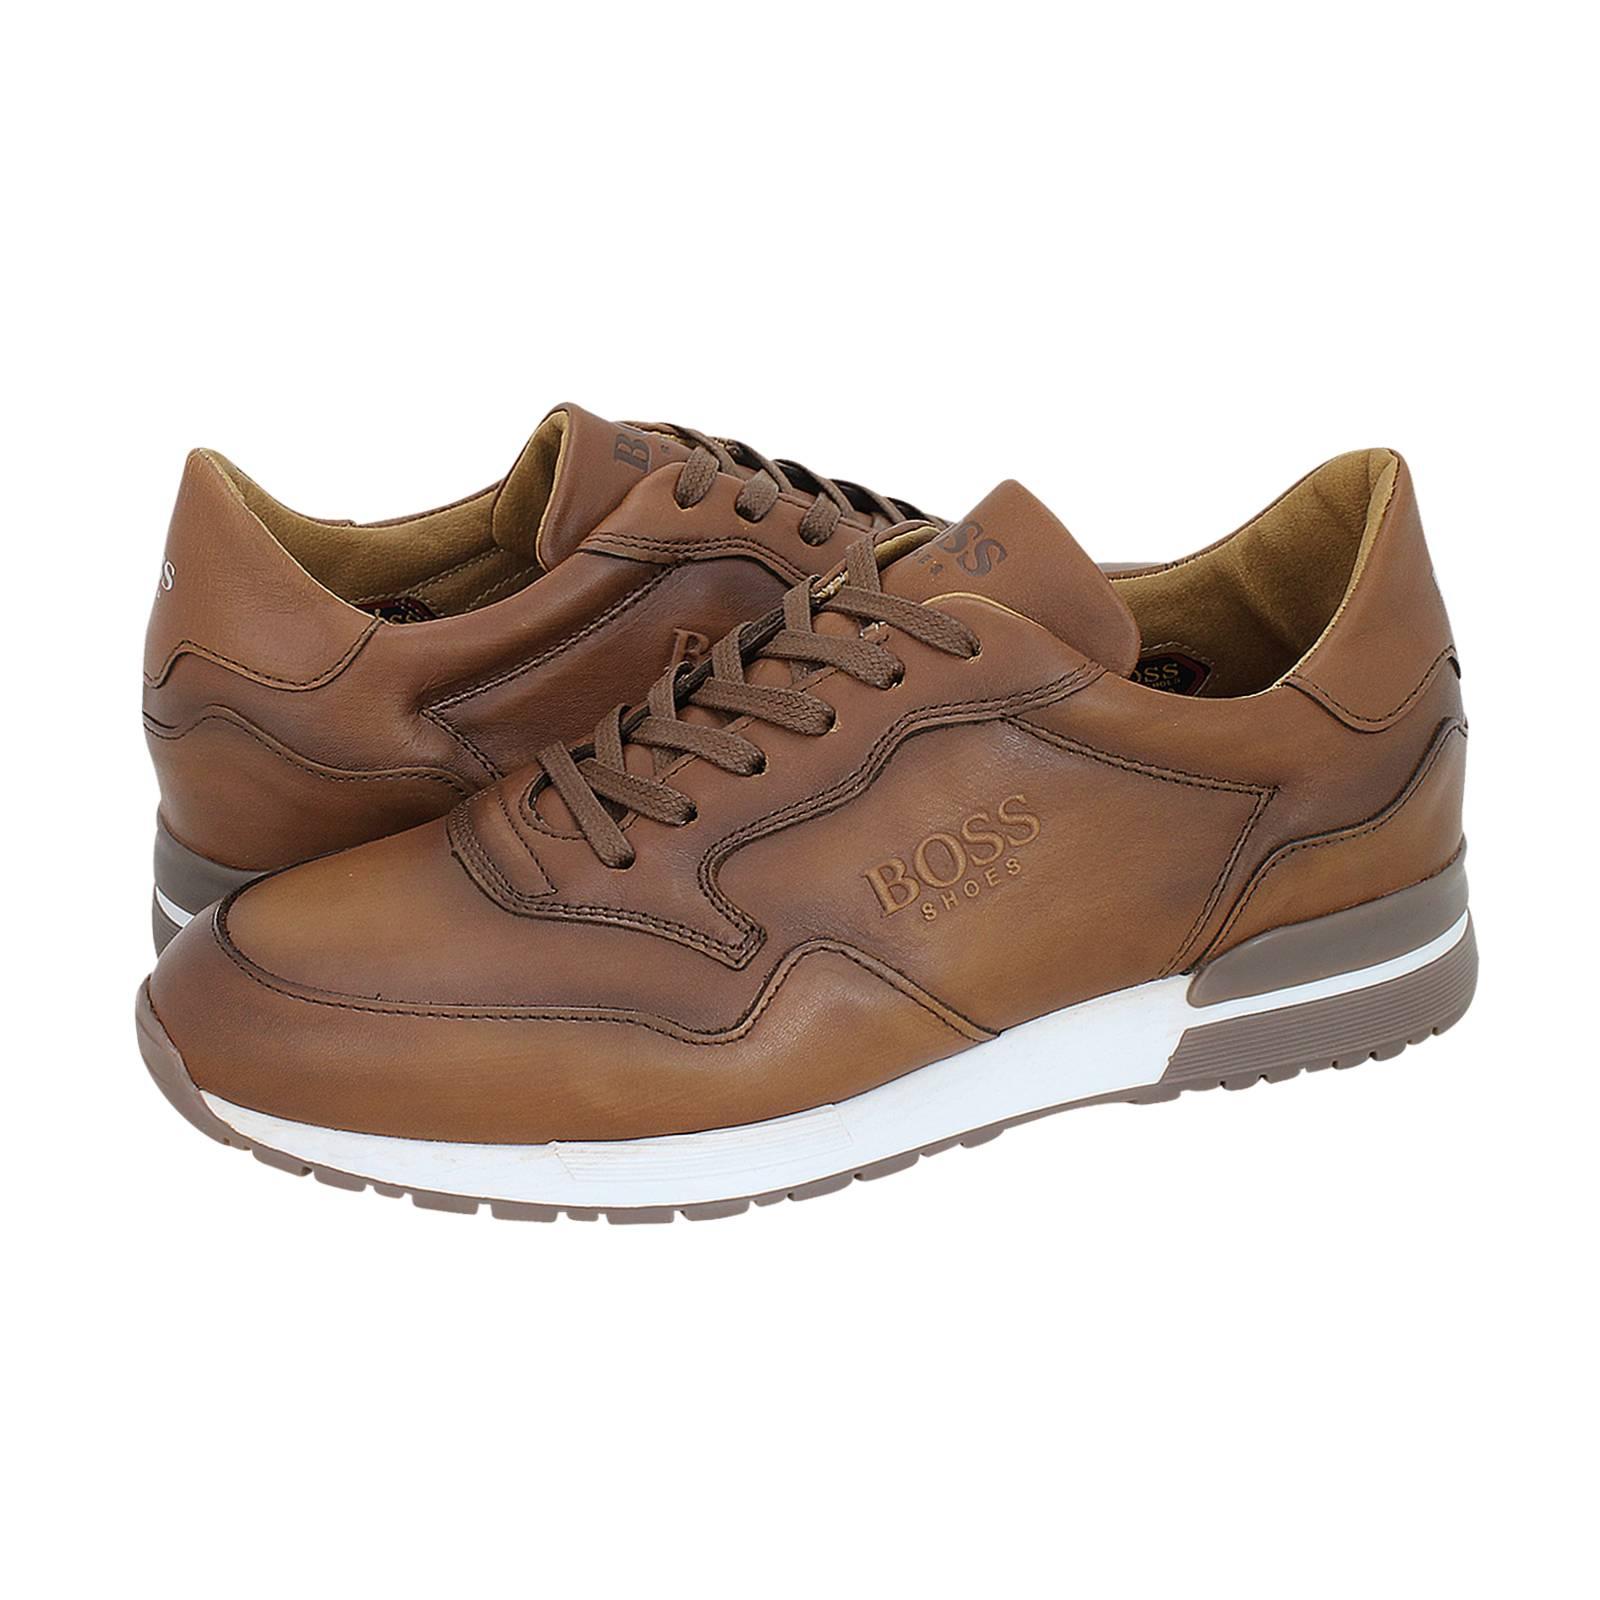 198003828 Charmant - Boss Men's casual shoes made of leather - Gianna Kazakou ...